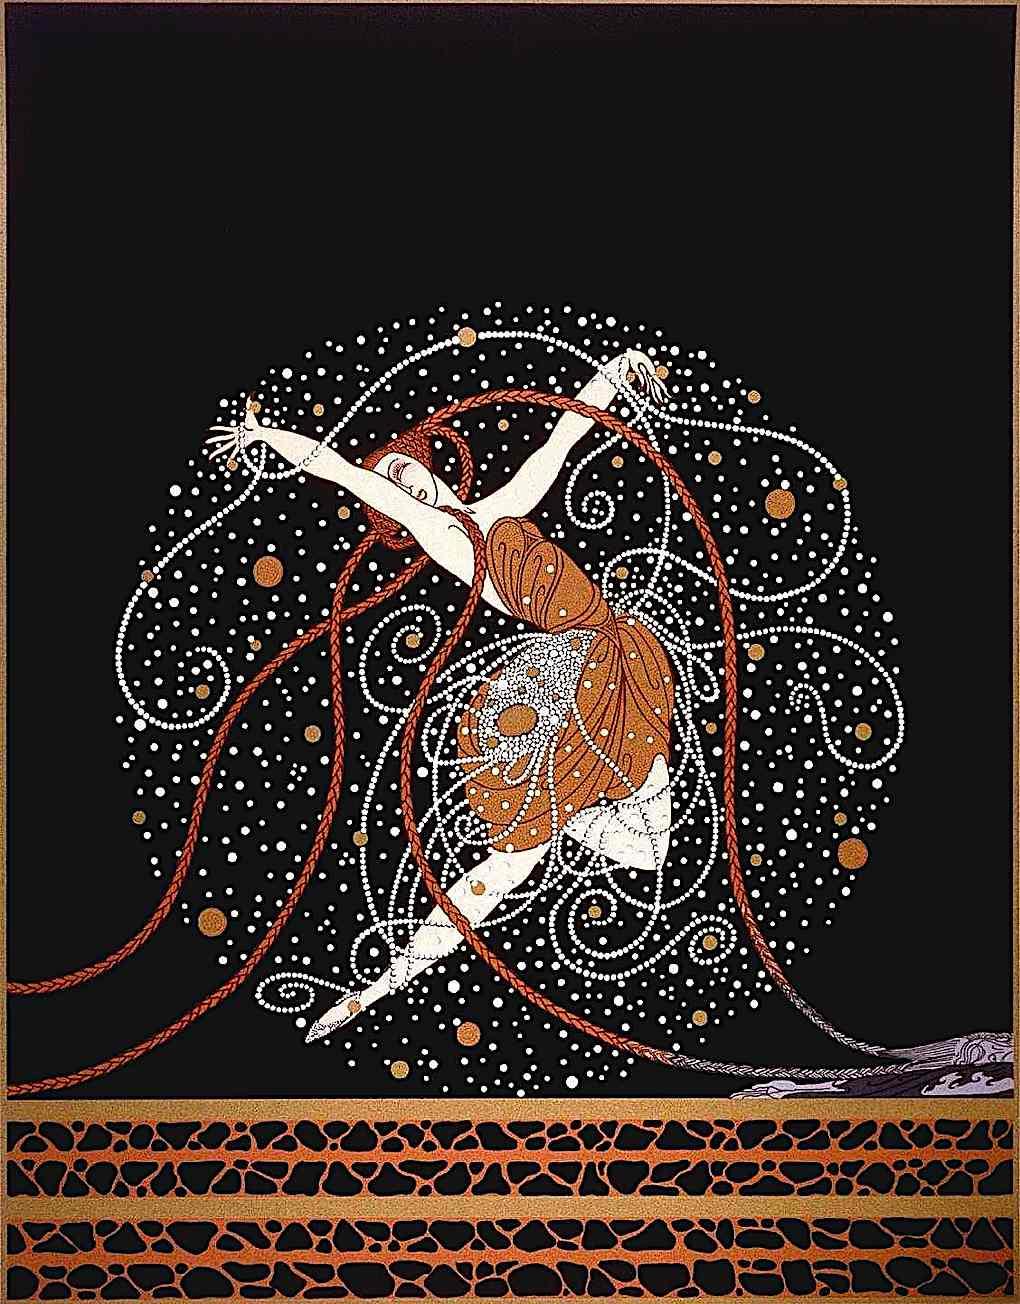 an Erté fashion illustration of a dancing woman